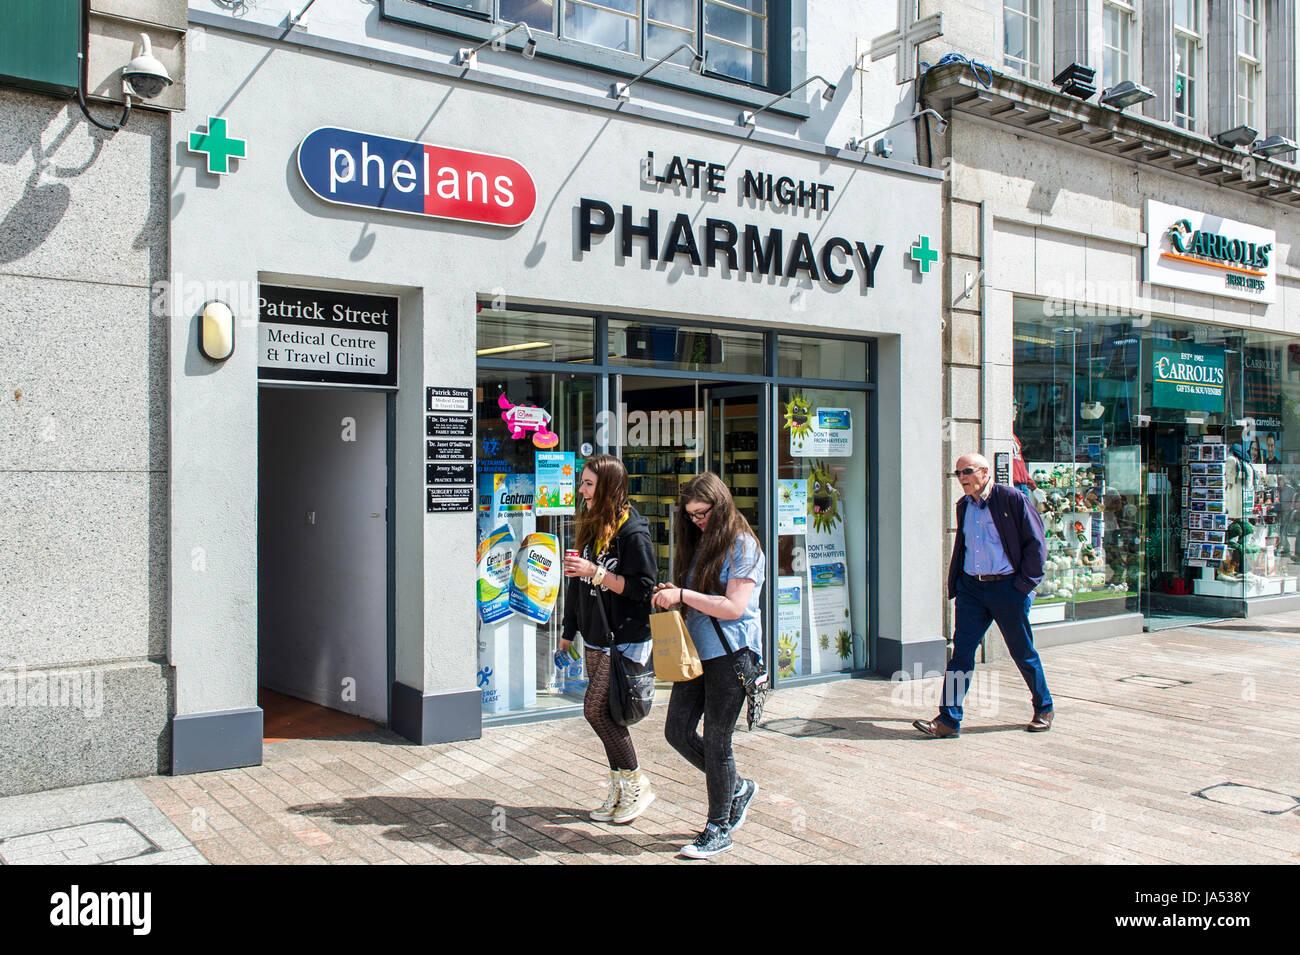 People walking past a late night pharmacy chemist on Patrick Street, Cork, Ireland. - Stock Image